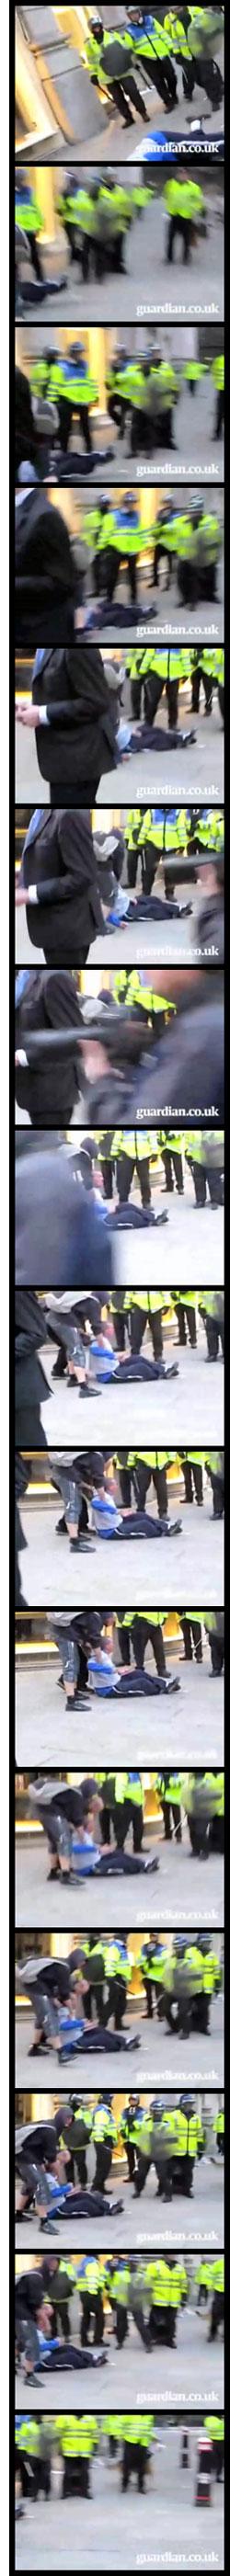 FIT cop kicking Ian Tomlinson?